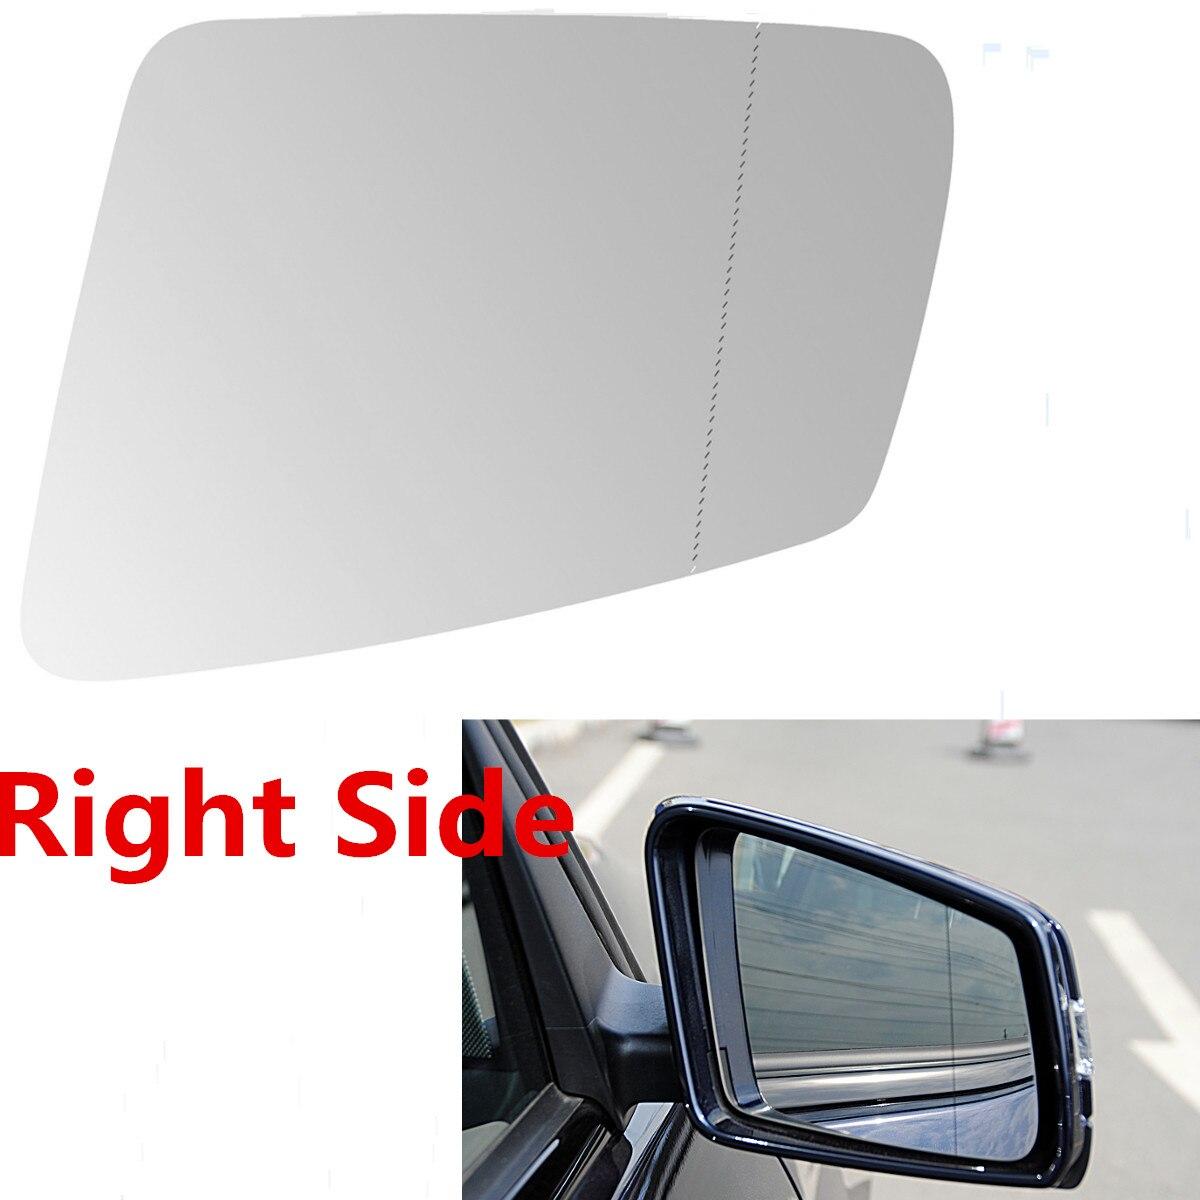 Right Side Mirror Glass Rear View W/Heated For Mercedes C180 C200 C300 E200 E300